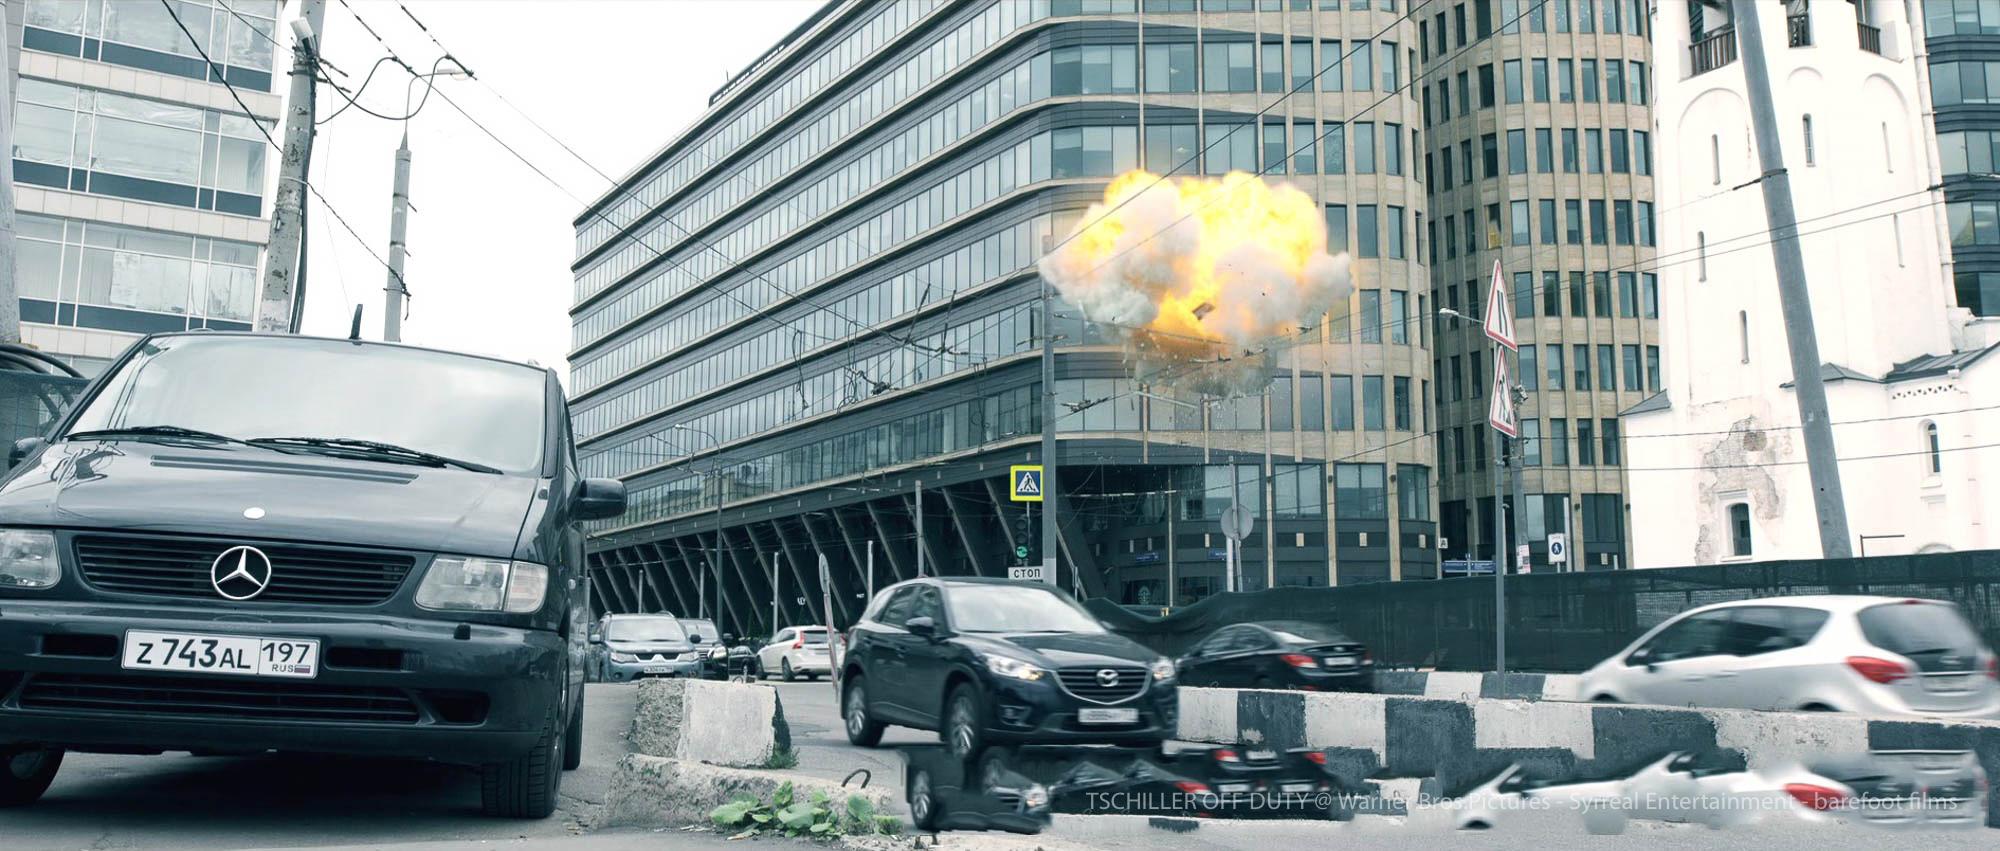 Tschiller off duty Regie Christian Alvart Til Schweiger Thomas Freudenthal Szenenbild Production Design Hamburg Berlin Germany Istanbul Moskau Moskow